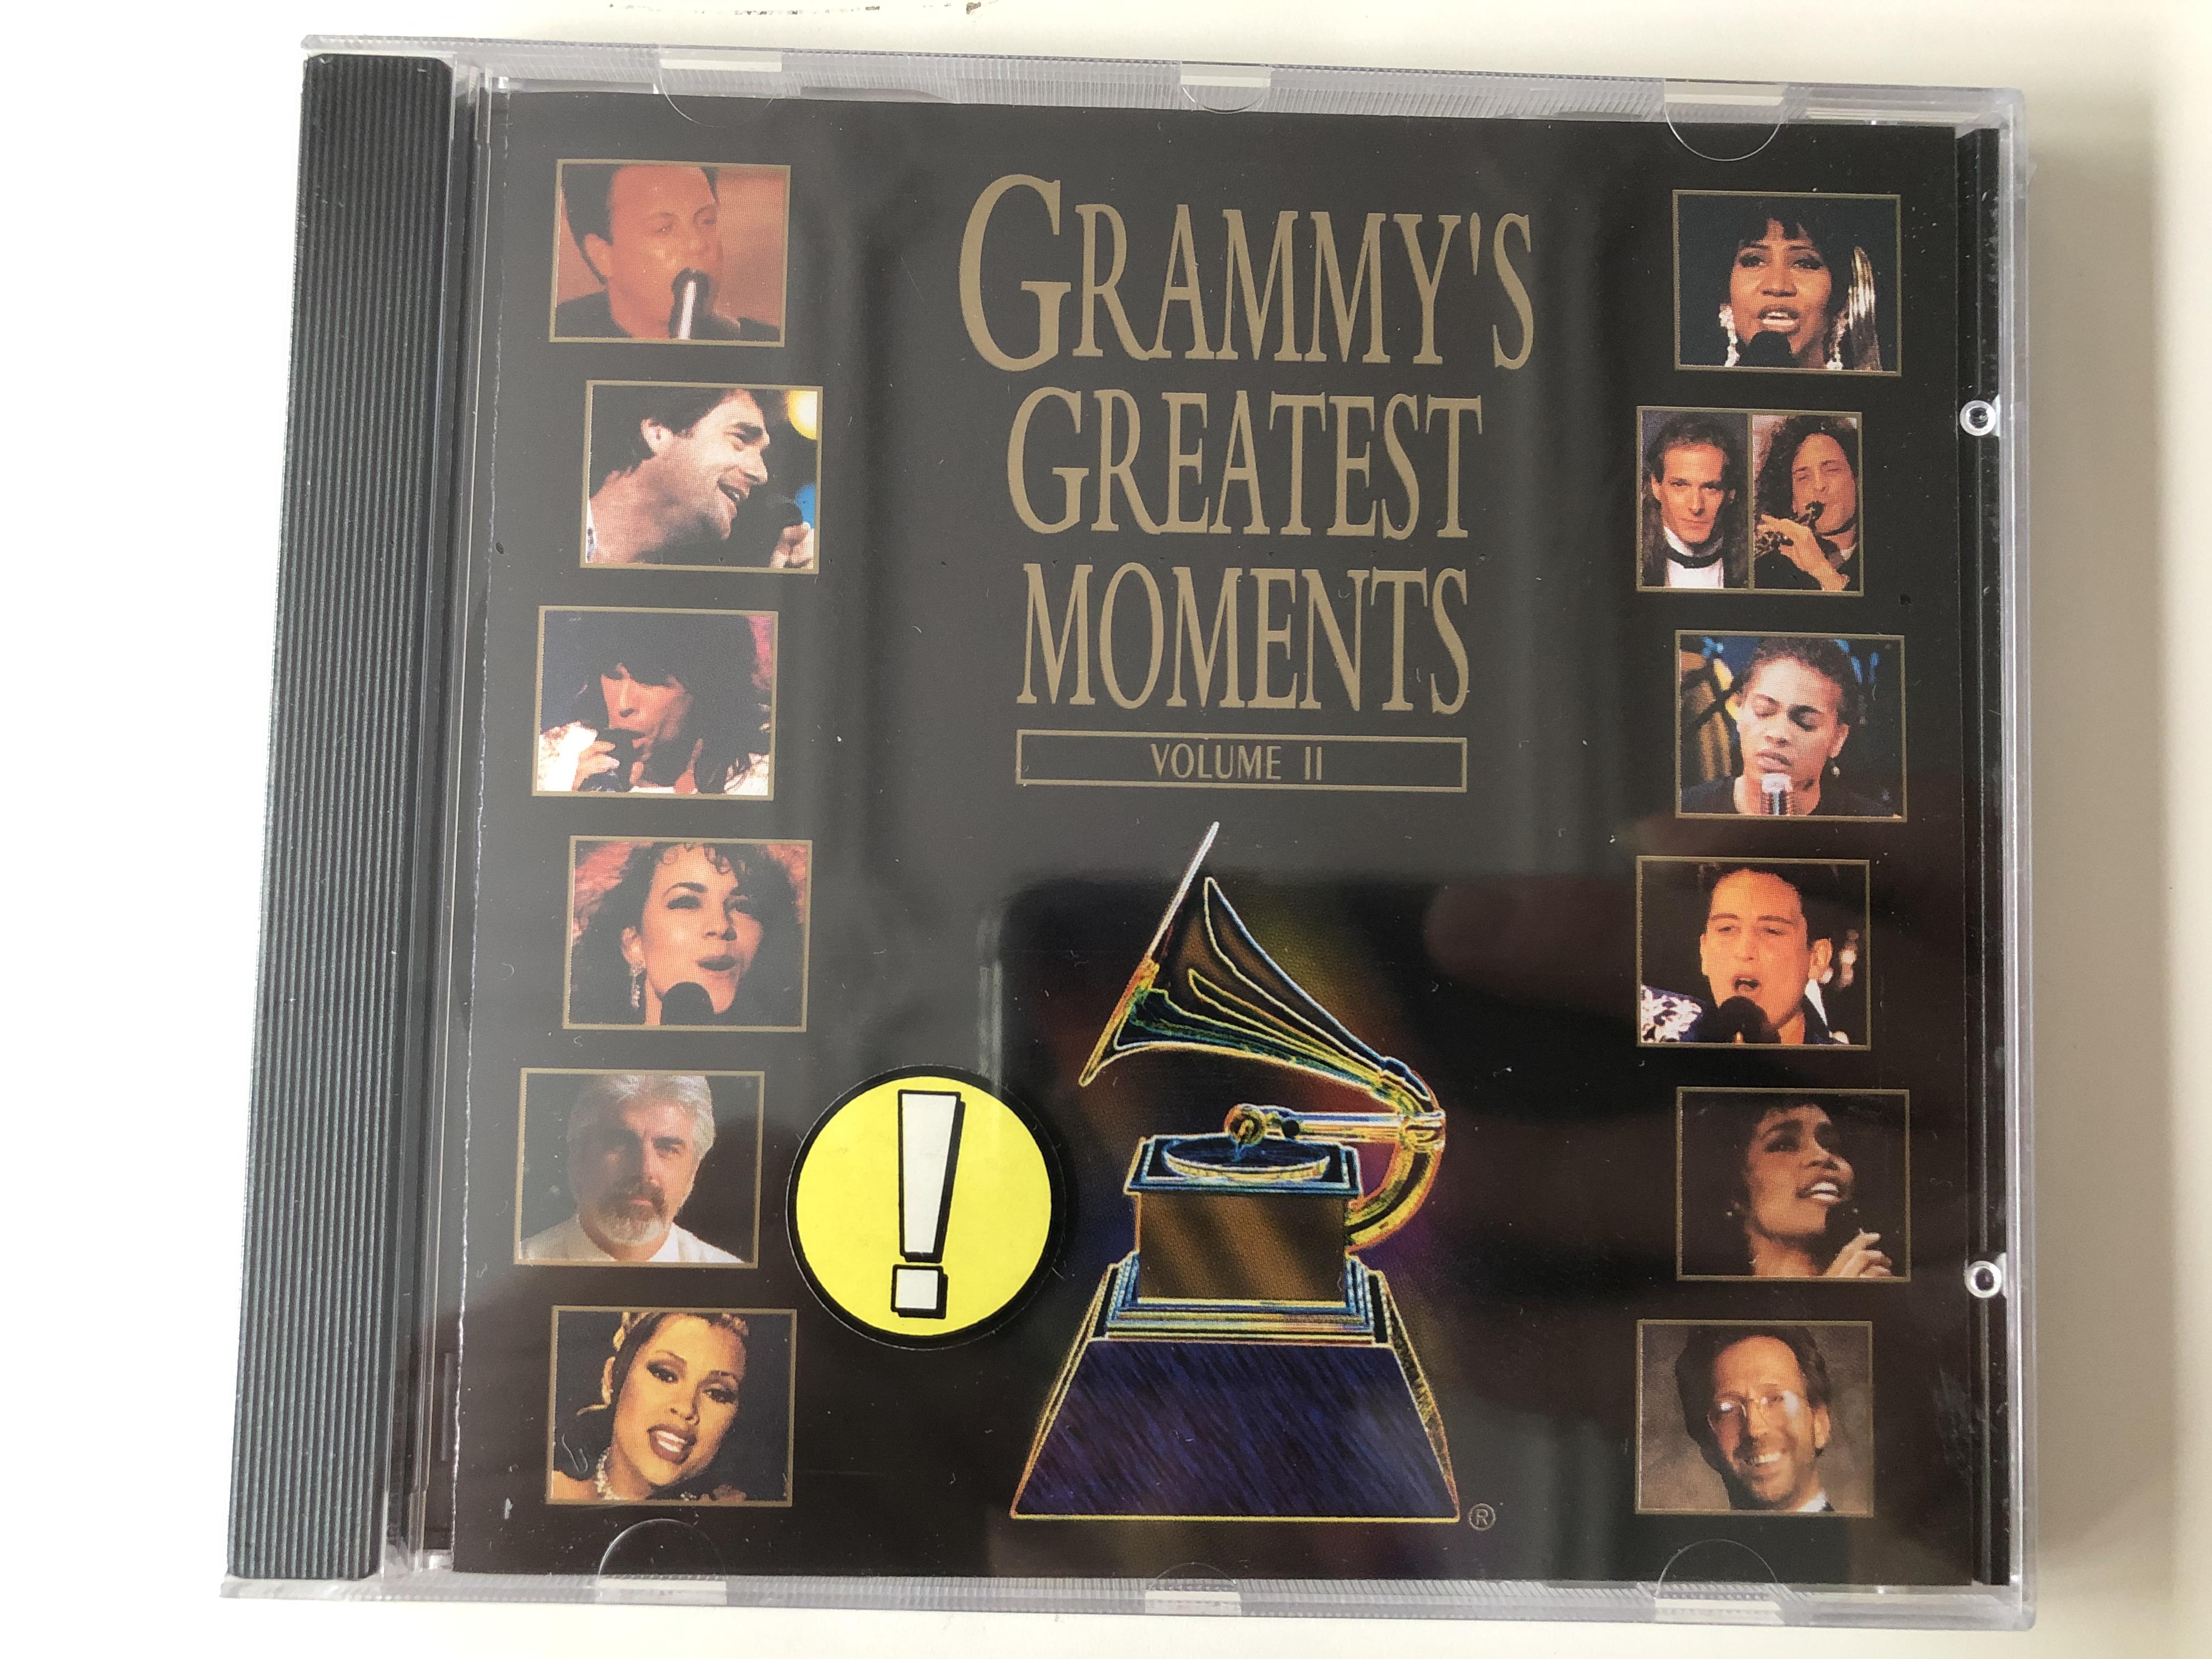 grammy-s-greatest-moments-volume-ii-atlantic-audio-cd-1994-7567-82575-2-1-.jpg